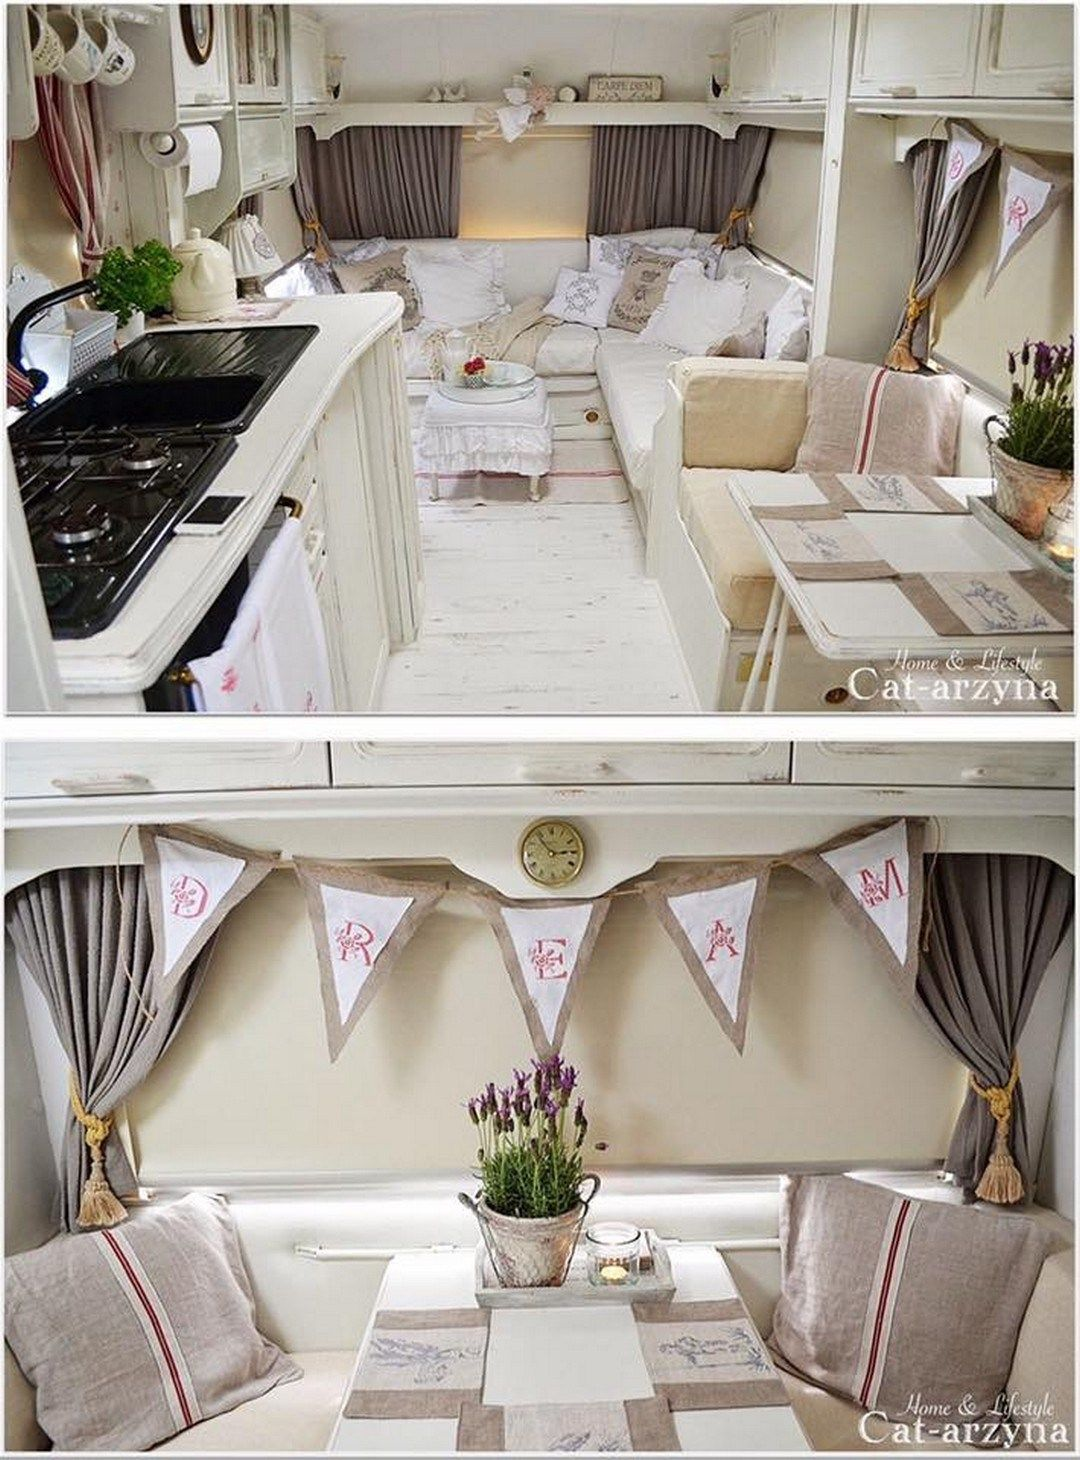 70 amazing rv camper interior design 69. Black Bedroom Furniture Sets. Home Design Ideas